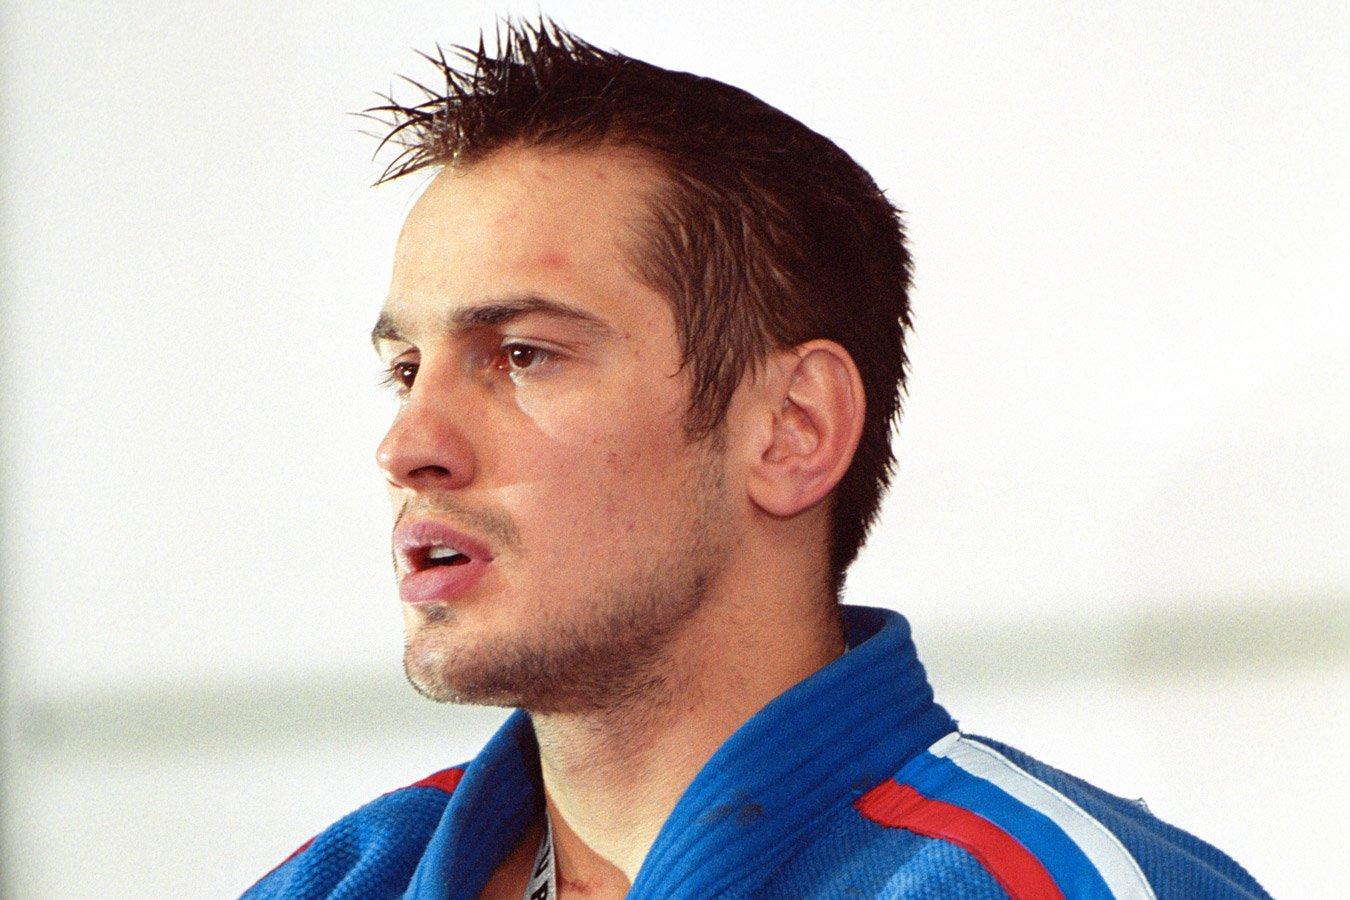 Дмитрий Носов завоевал бронзу в Афинах-2004